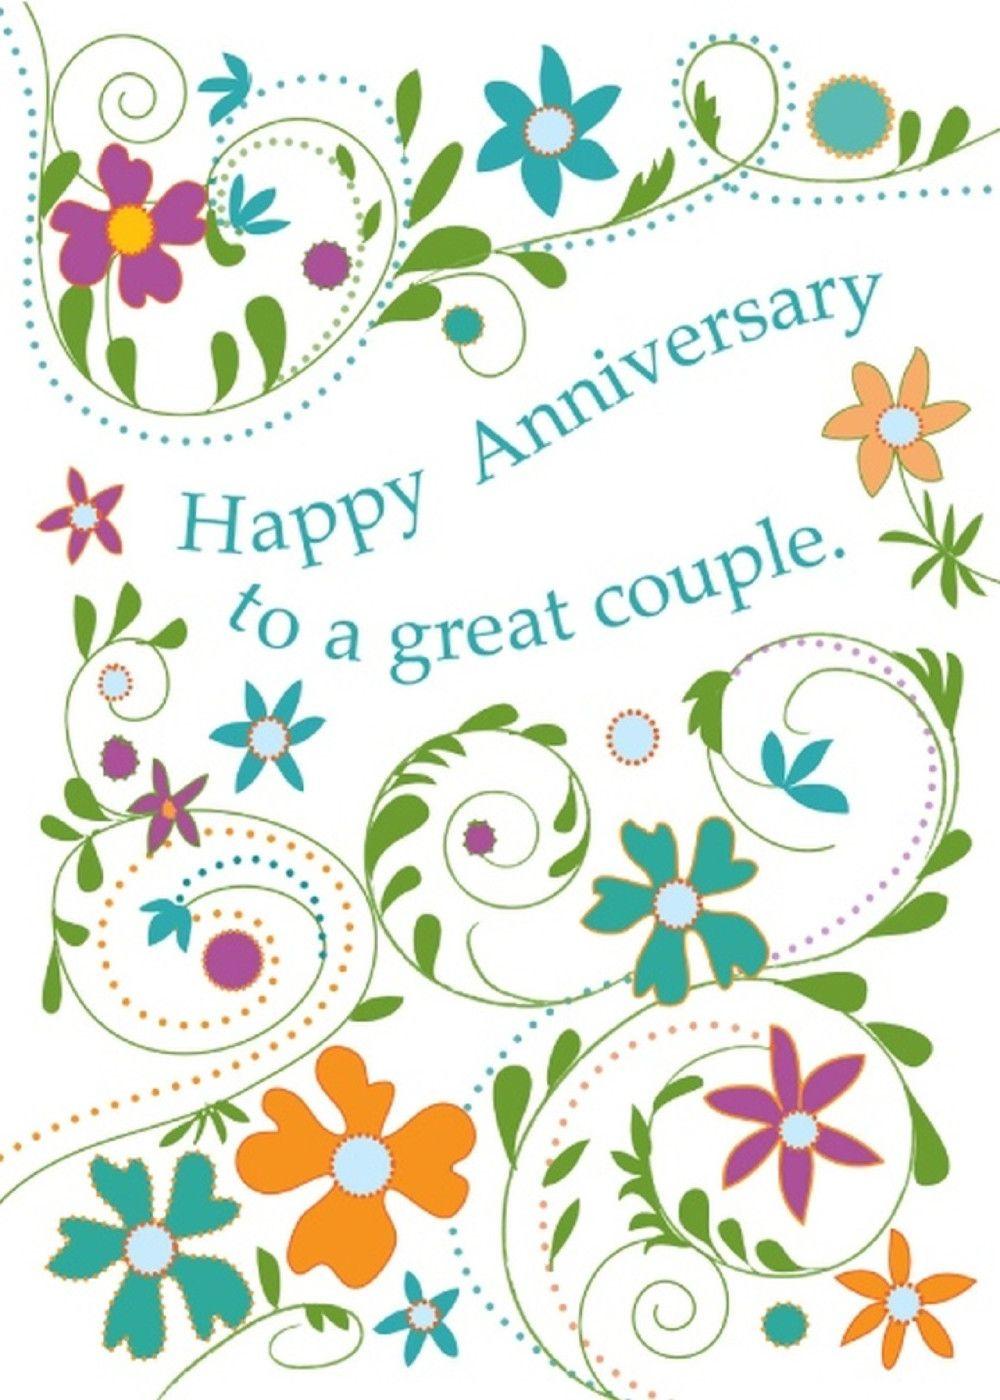 Anniv Card Happy anniversary friends, Happy anniversary